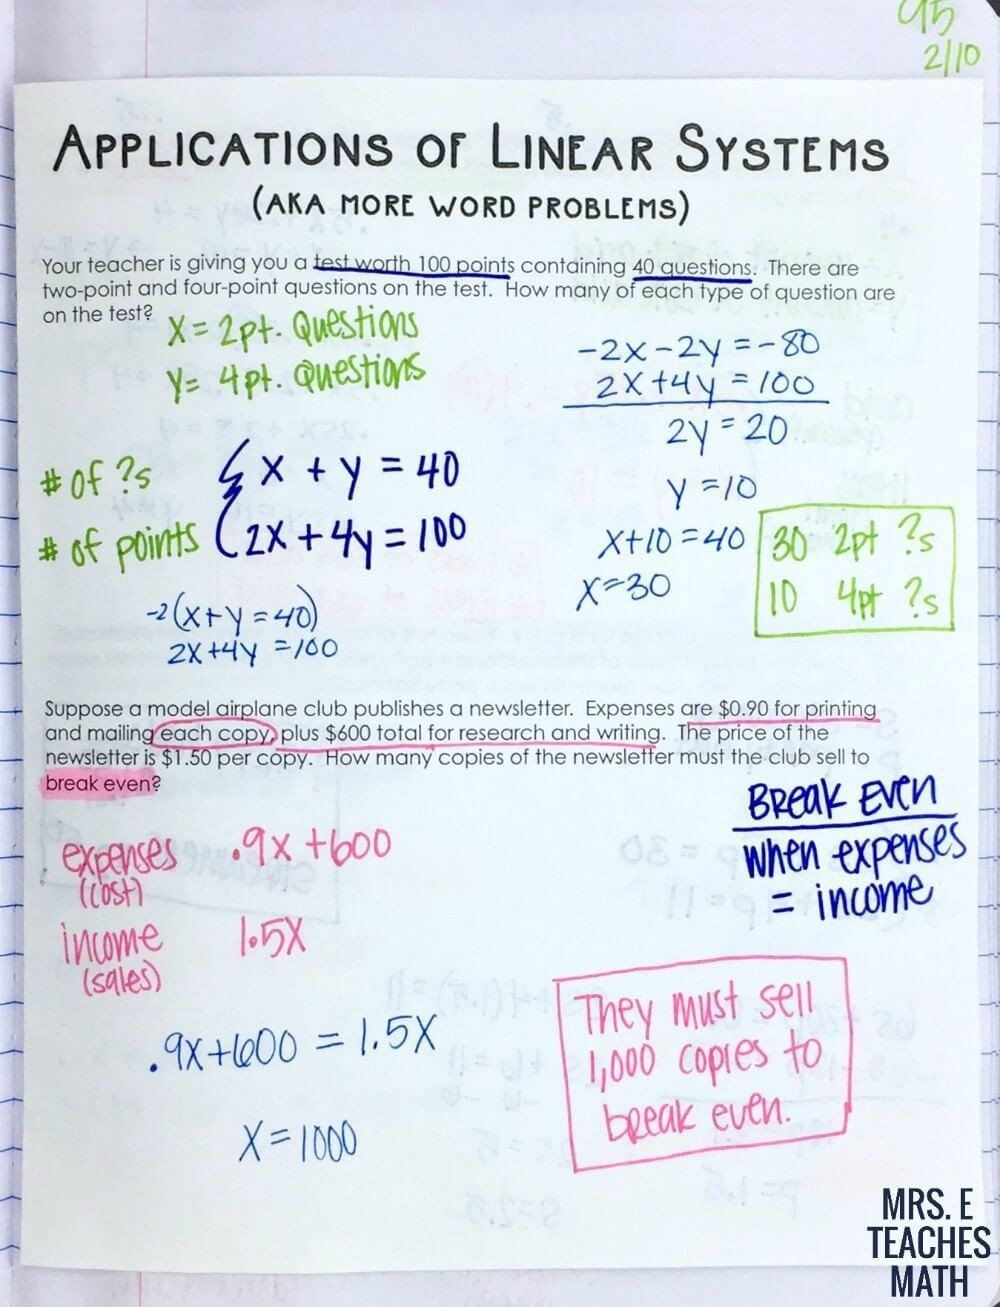 Solving Equations Word Problems Worksheet Systems Of Linear Equations Word Problems Inb Page Word Problems Word Problem Worksheets Math About Me